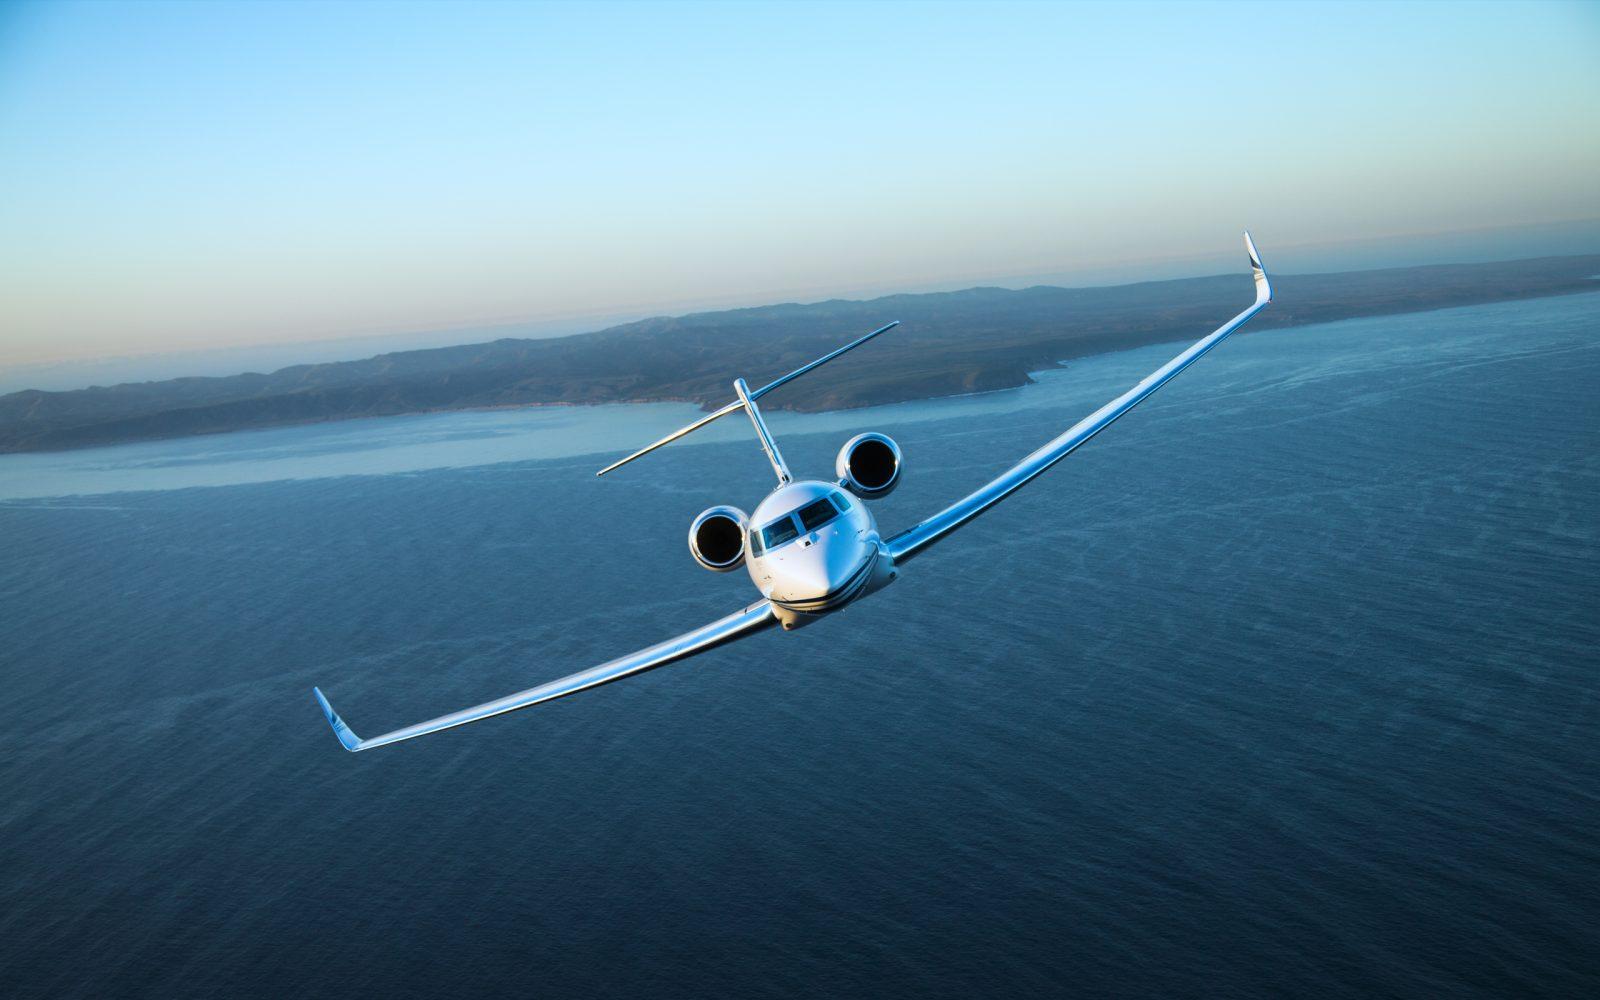 g650-take-off-1600x1000.jpg